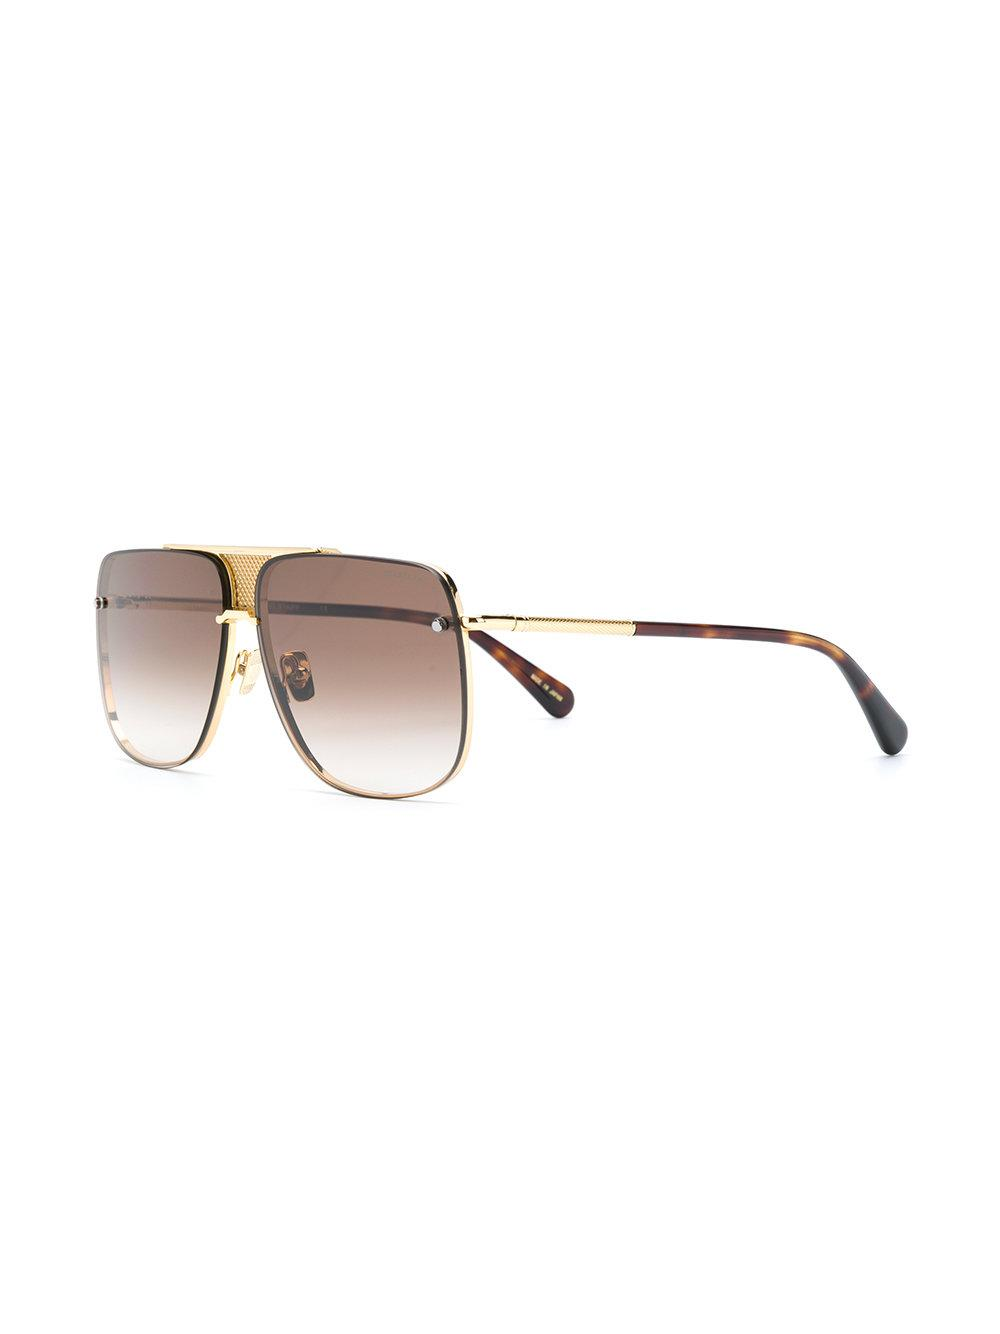 57c69bf242c1 Belstaff Sexton Square Sunglasses in Metallic for Men - Lyst